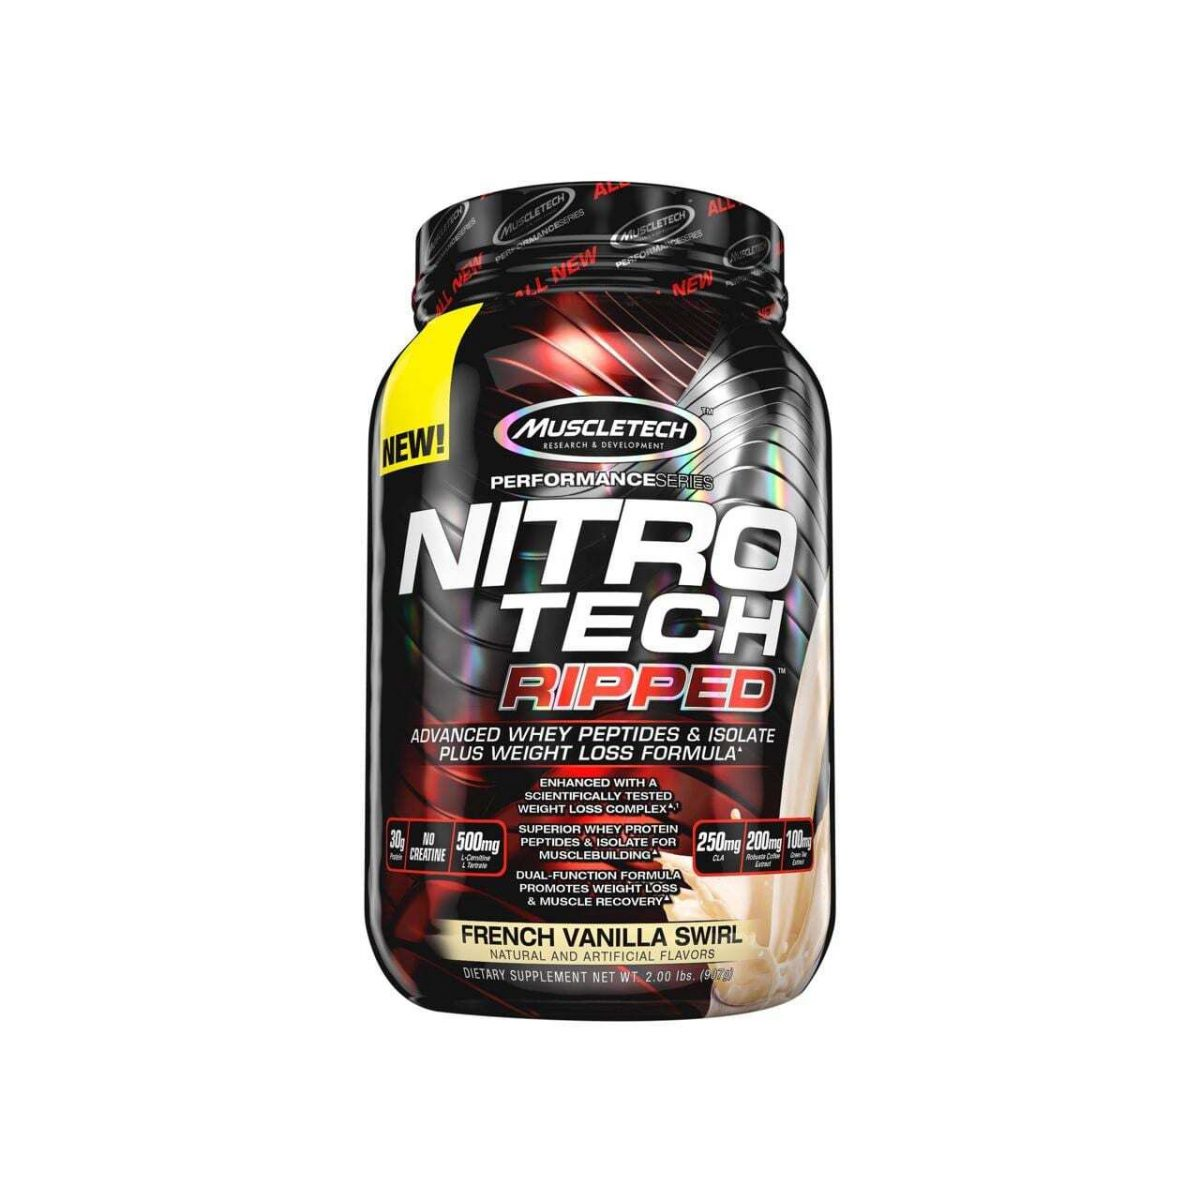 MuscleTech Performance Series Nitro Tech Ripped - French Vanilla Swirl - 2 lbs